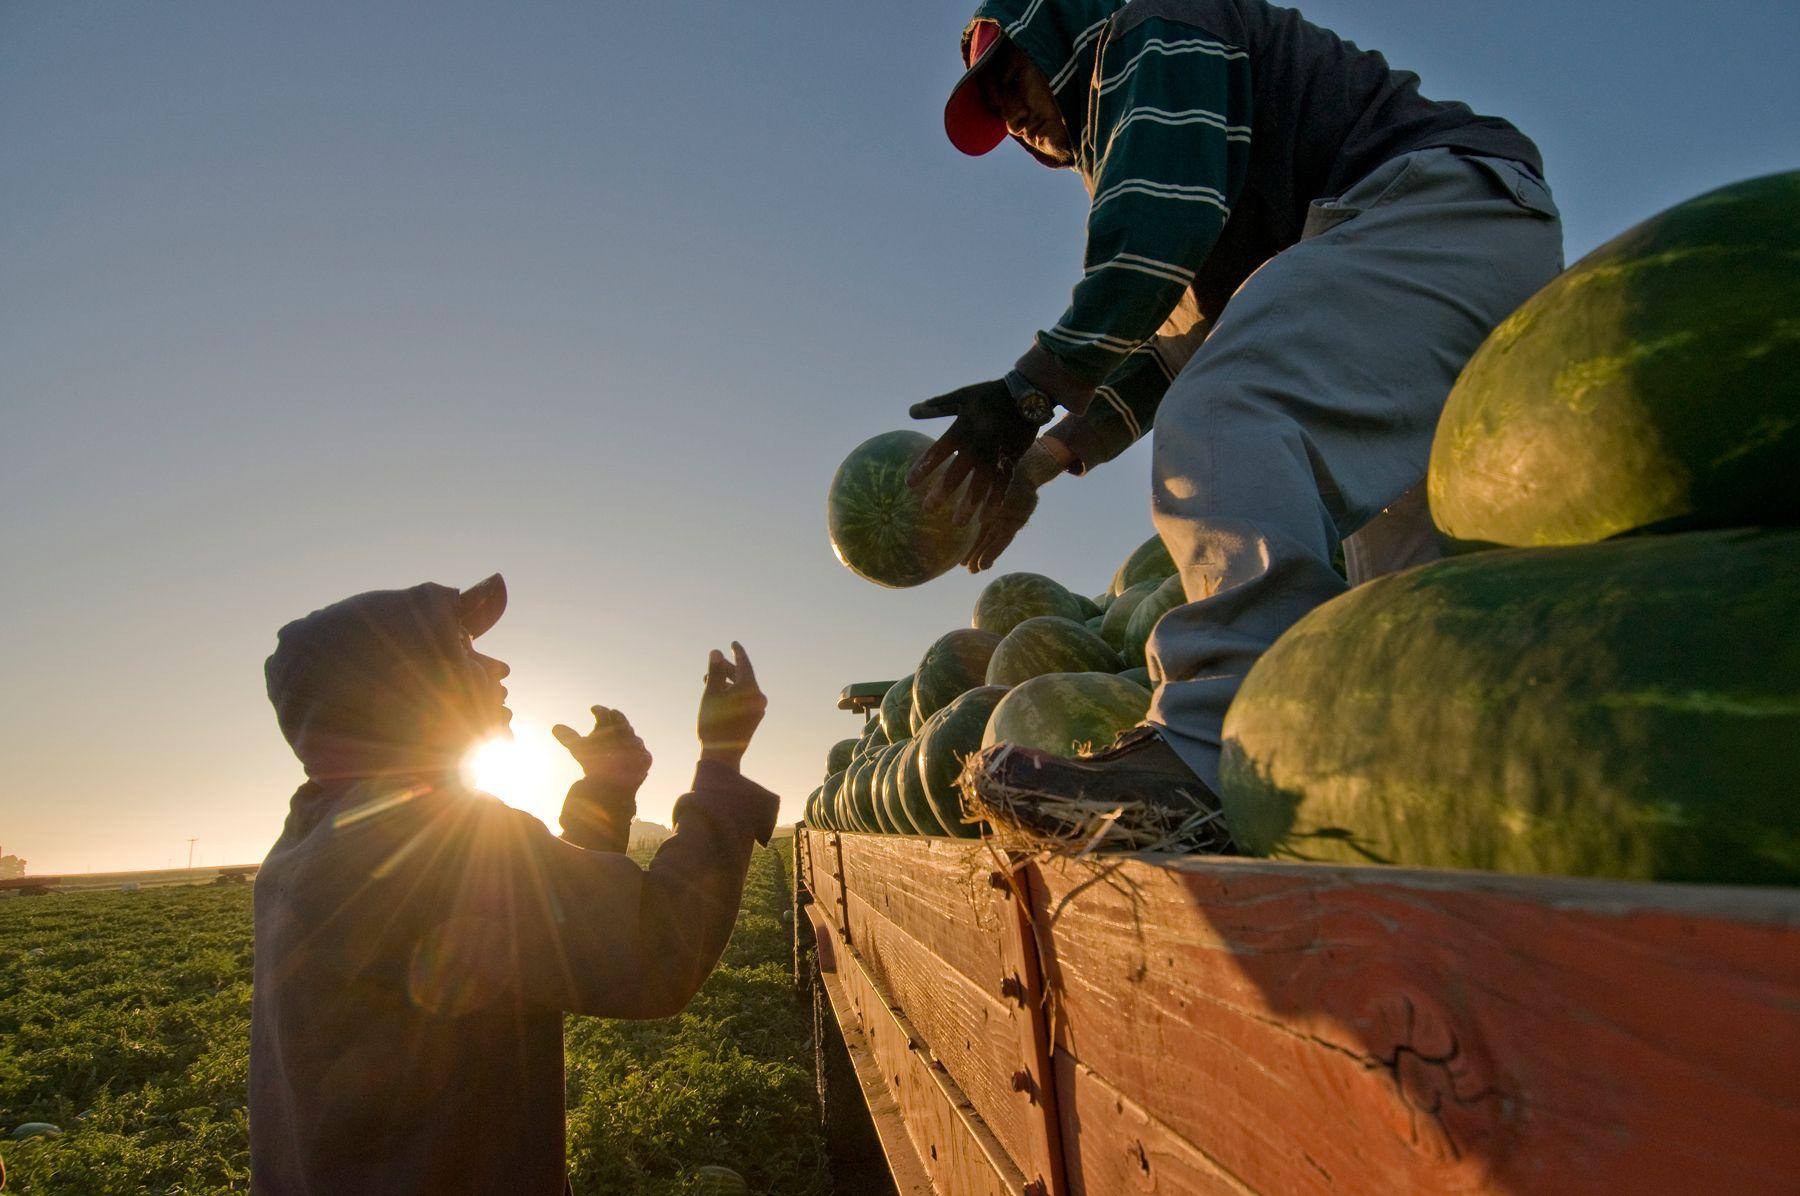 Watermelon Farm, Manteca, CA.